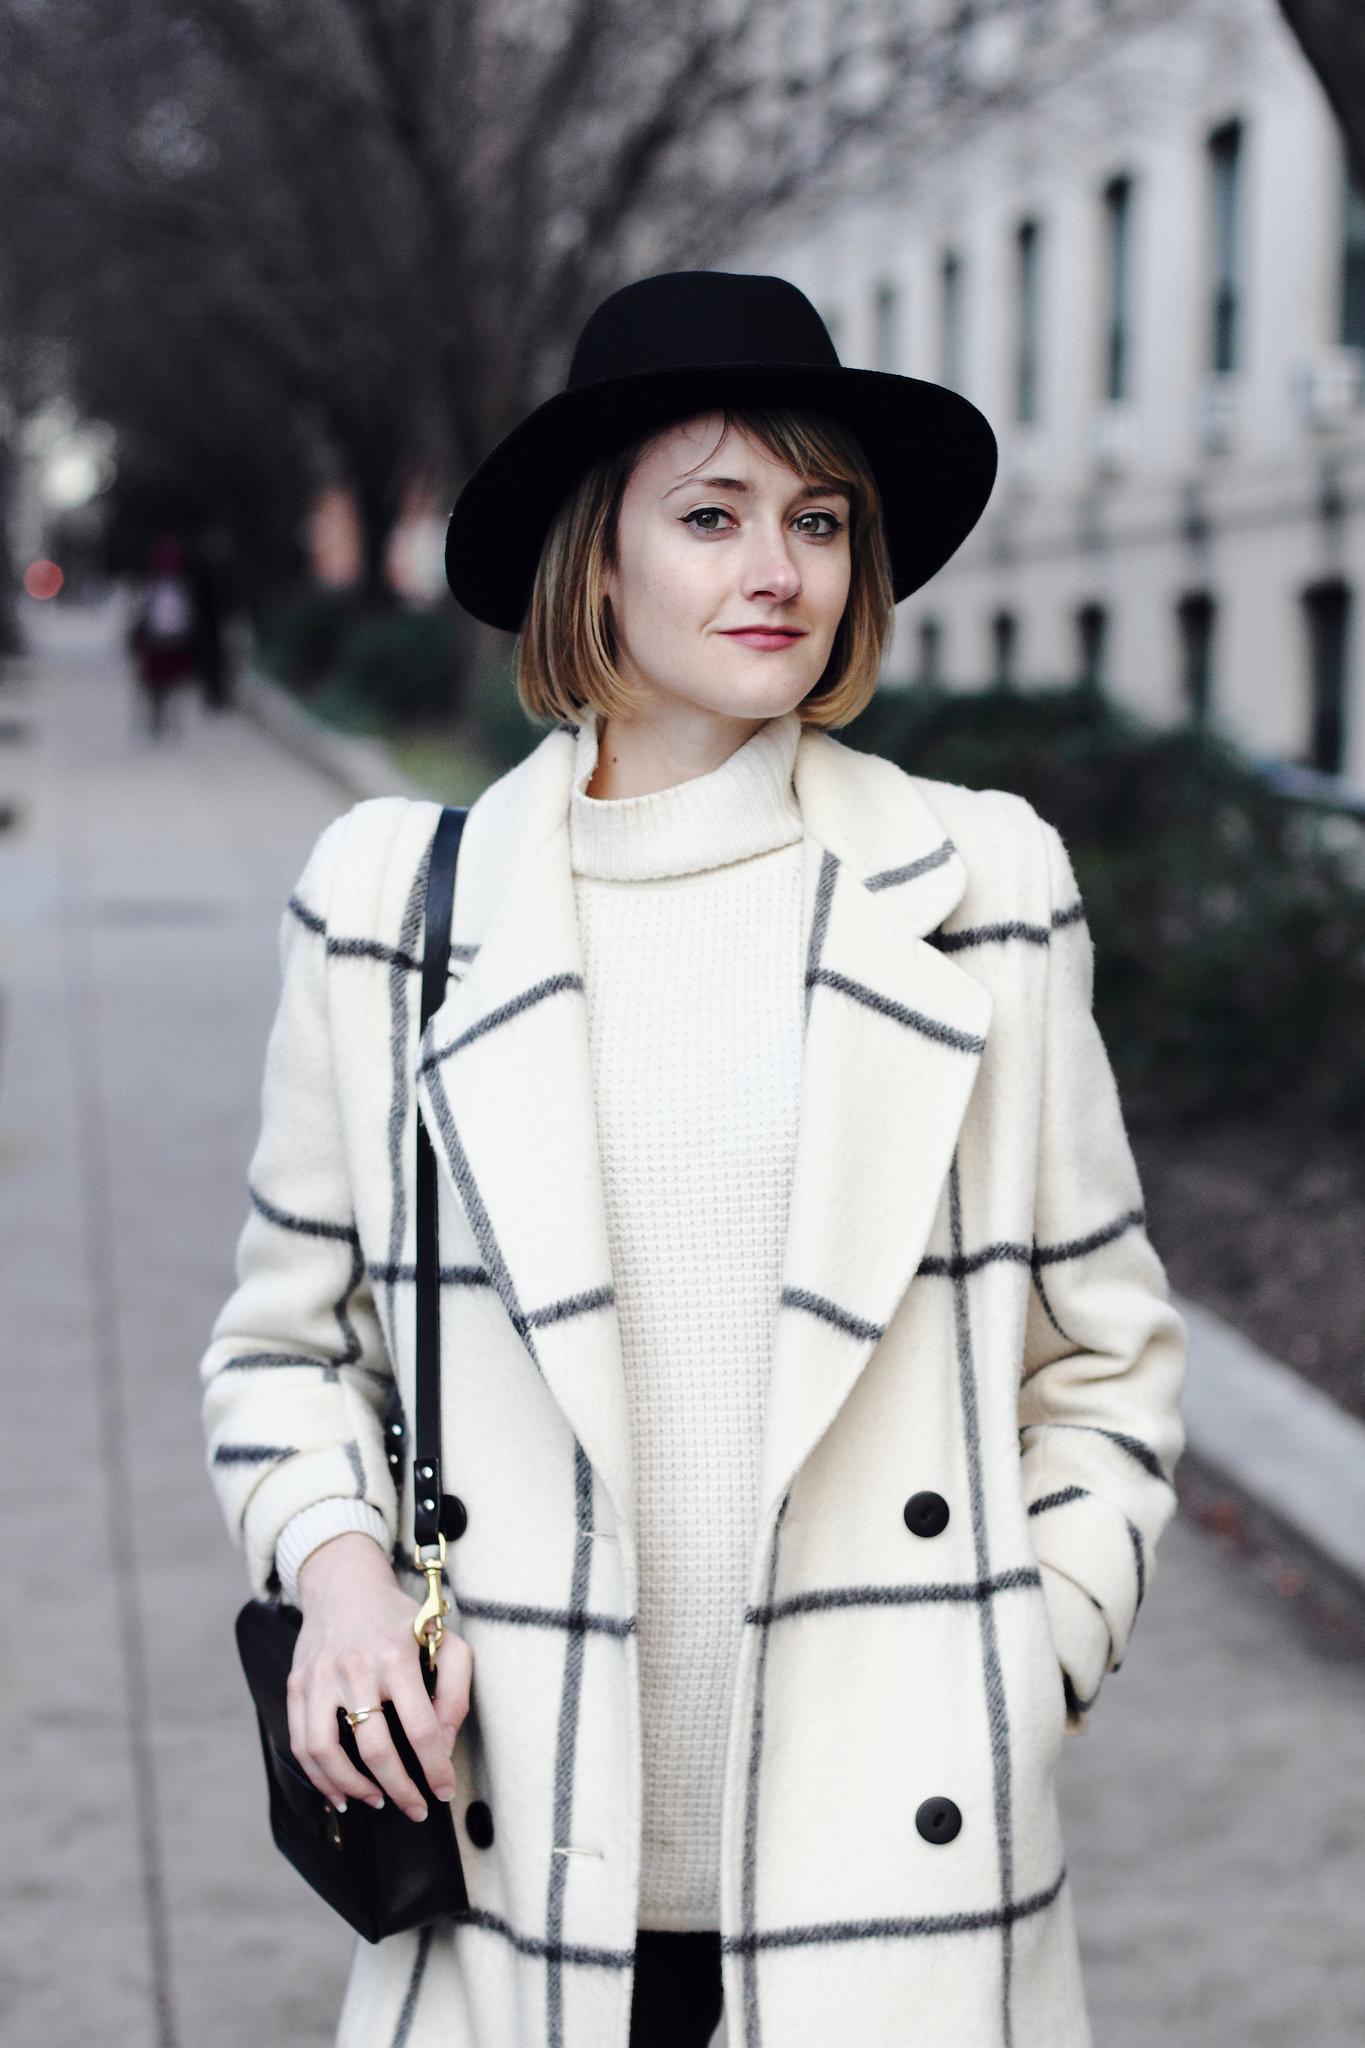 vintage check coat and black fedora